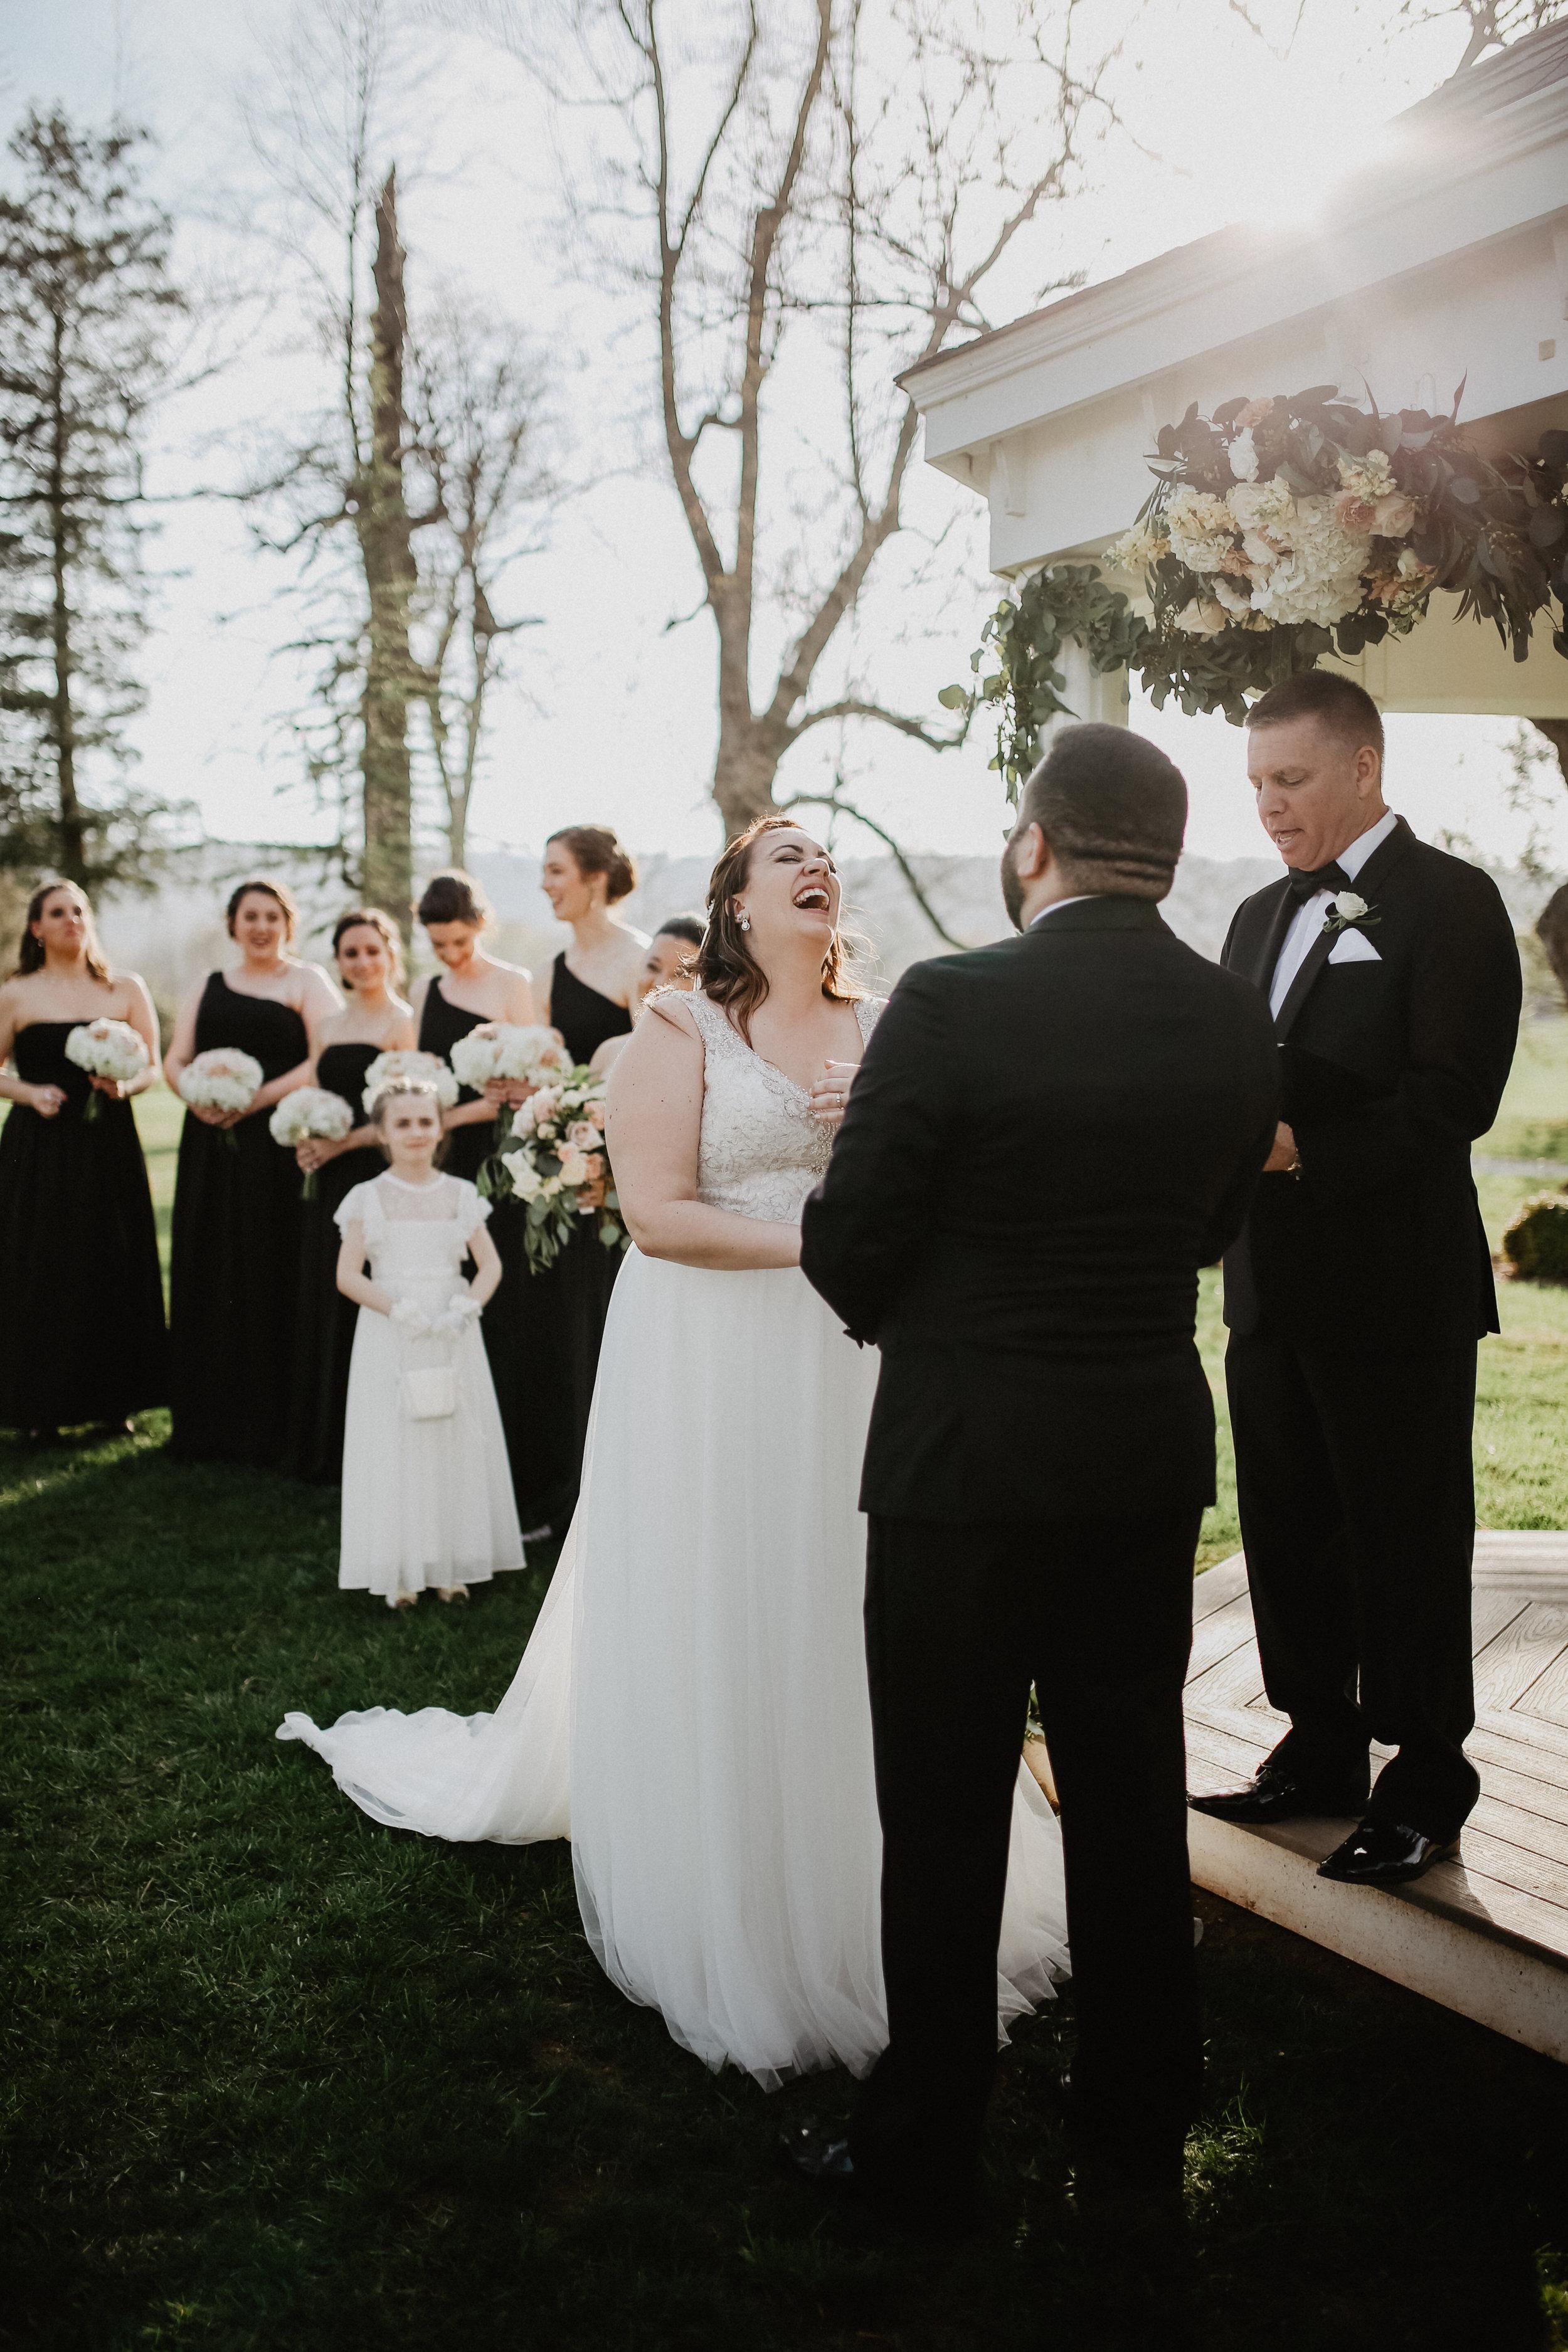 AnthonyKyndra_Married_2018-301.jpg